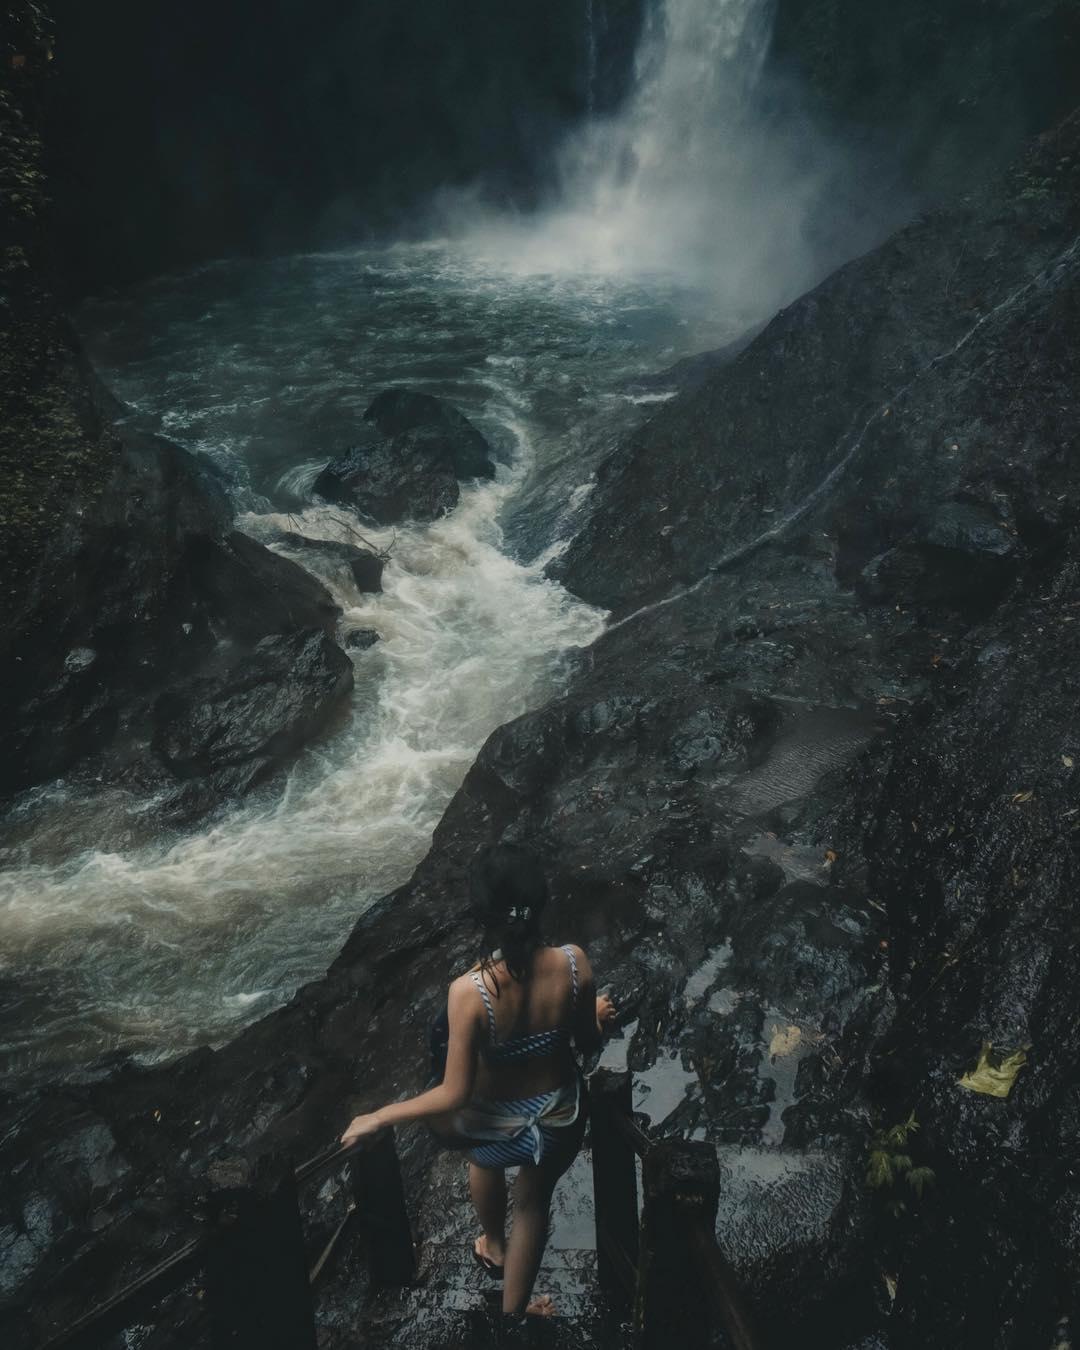 Aling-Aling Waterfall Bali Complete Guide For Tourist. via @gloriaimanuella